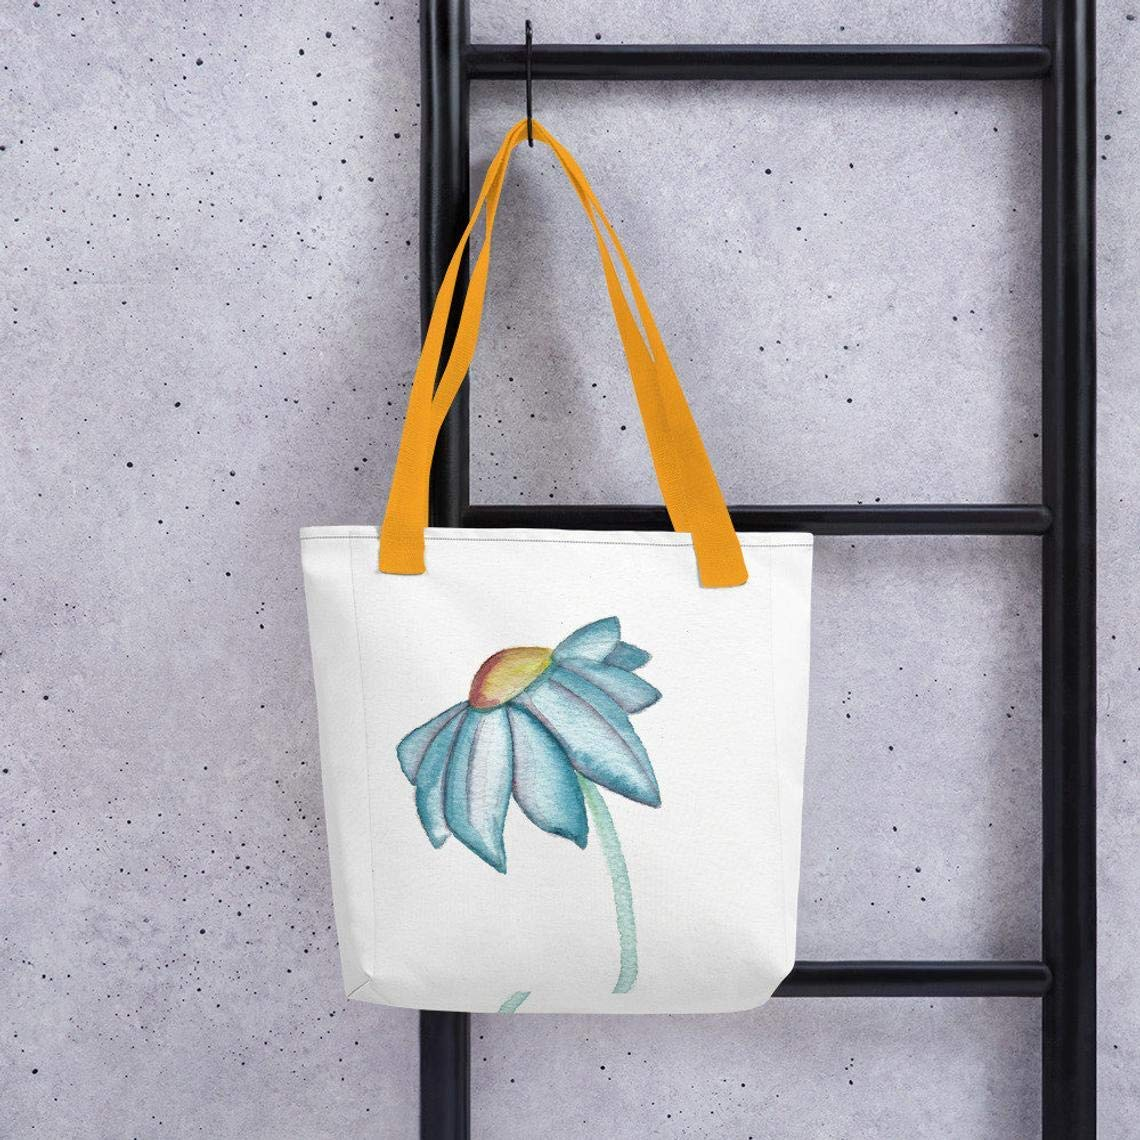 Daisy Tote Bag service Under blast sales